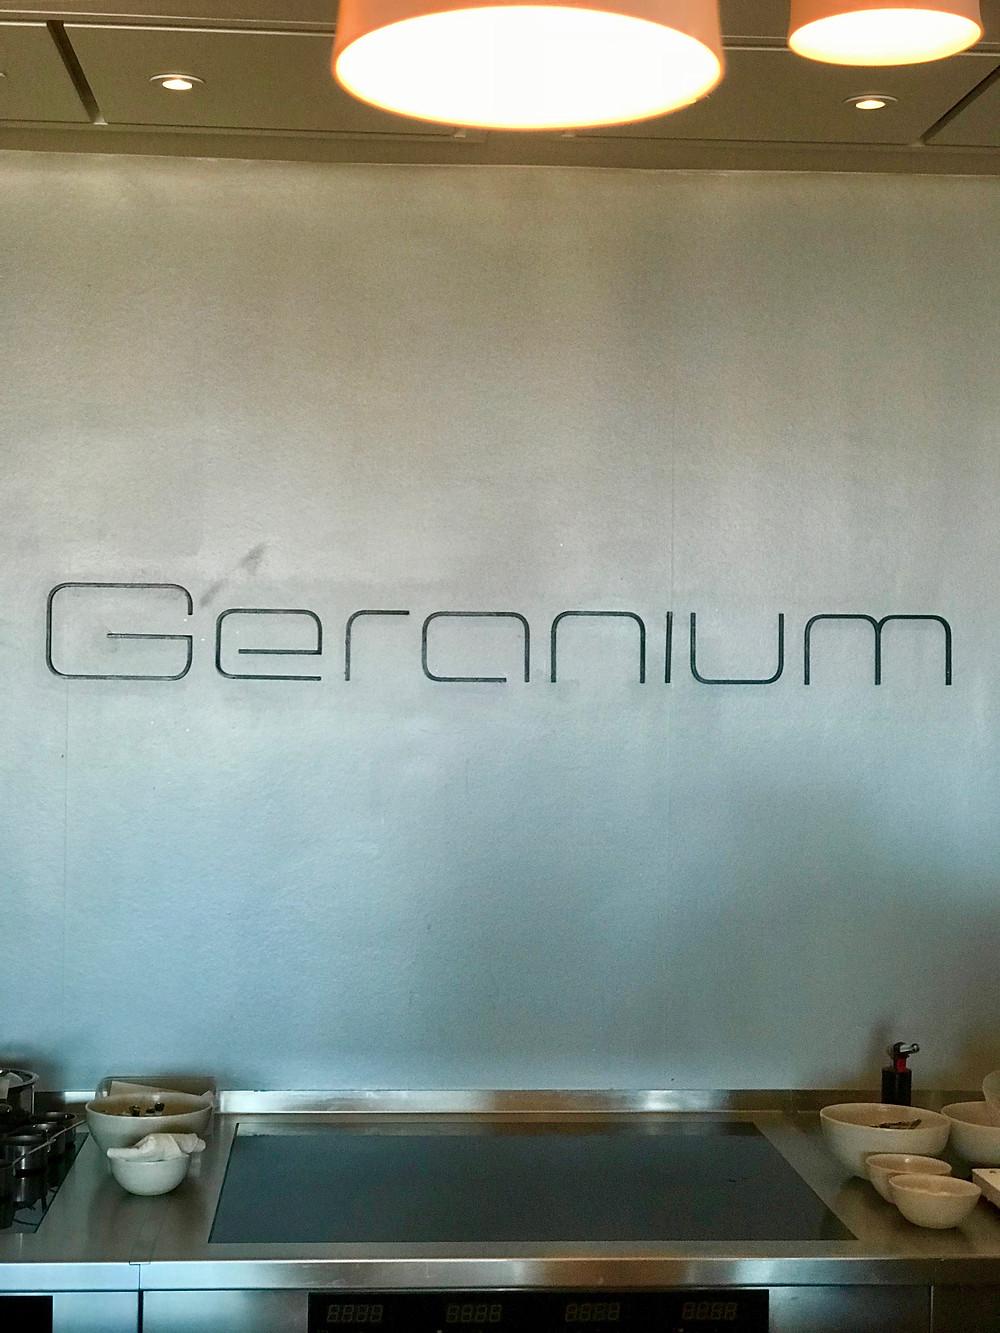 Geraniun